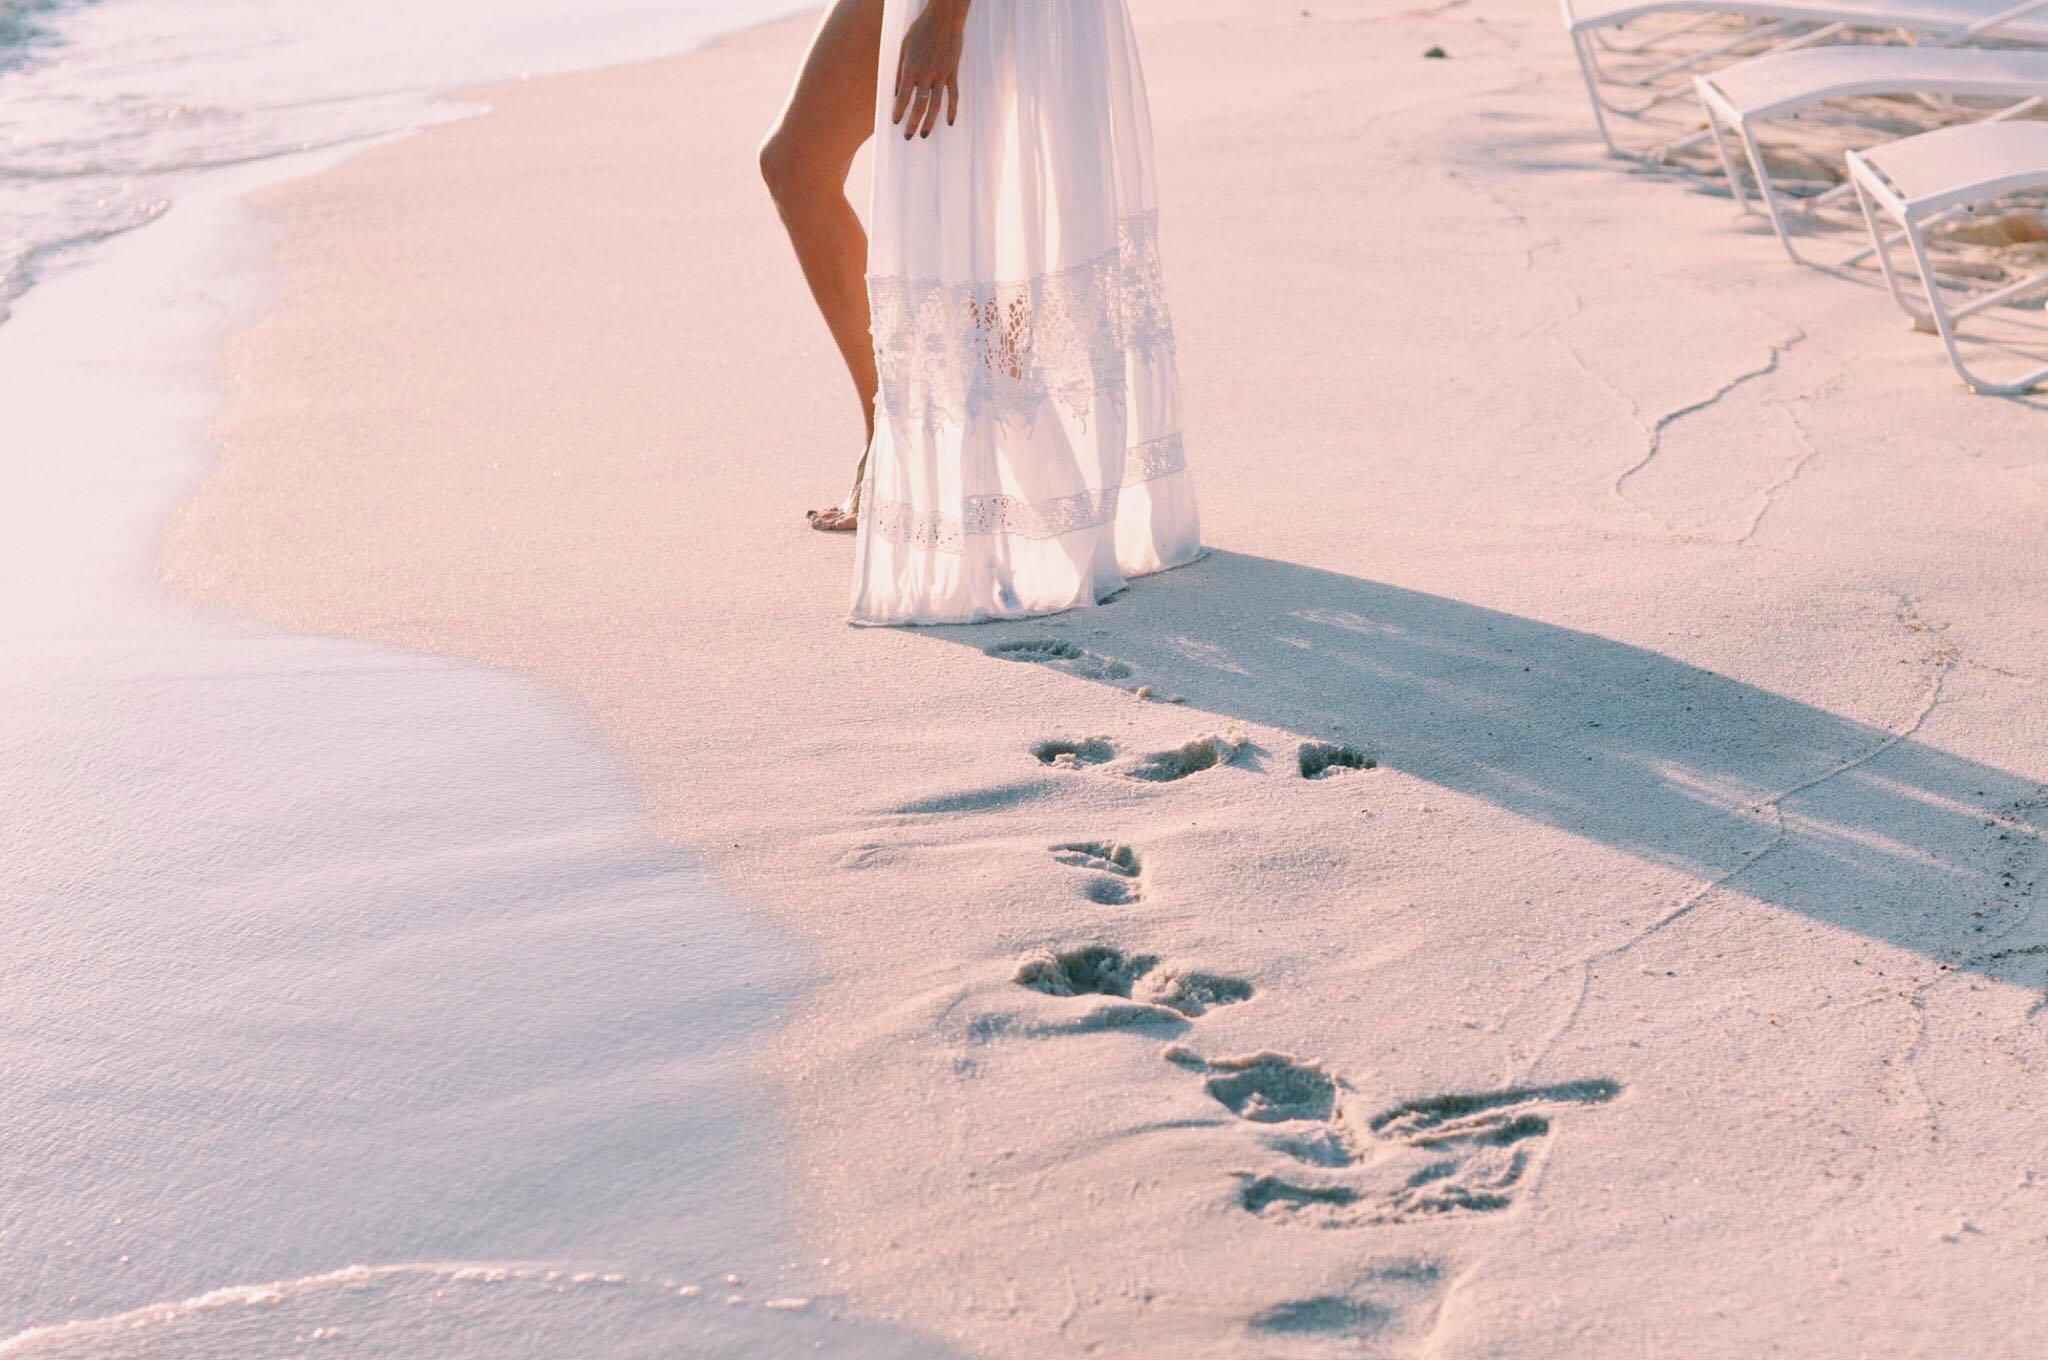 burcu_ozcan_chihuahua_mira_palmarina_palmalife_bodrum_yalikavak_palmalife_beach_burcuozcan_11